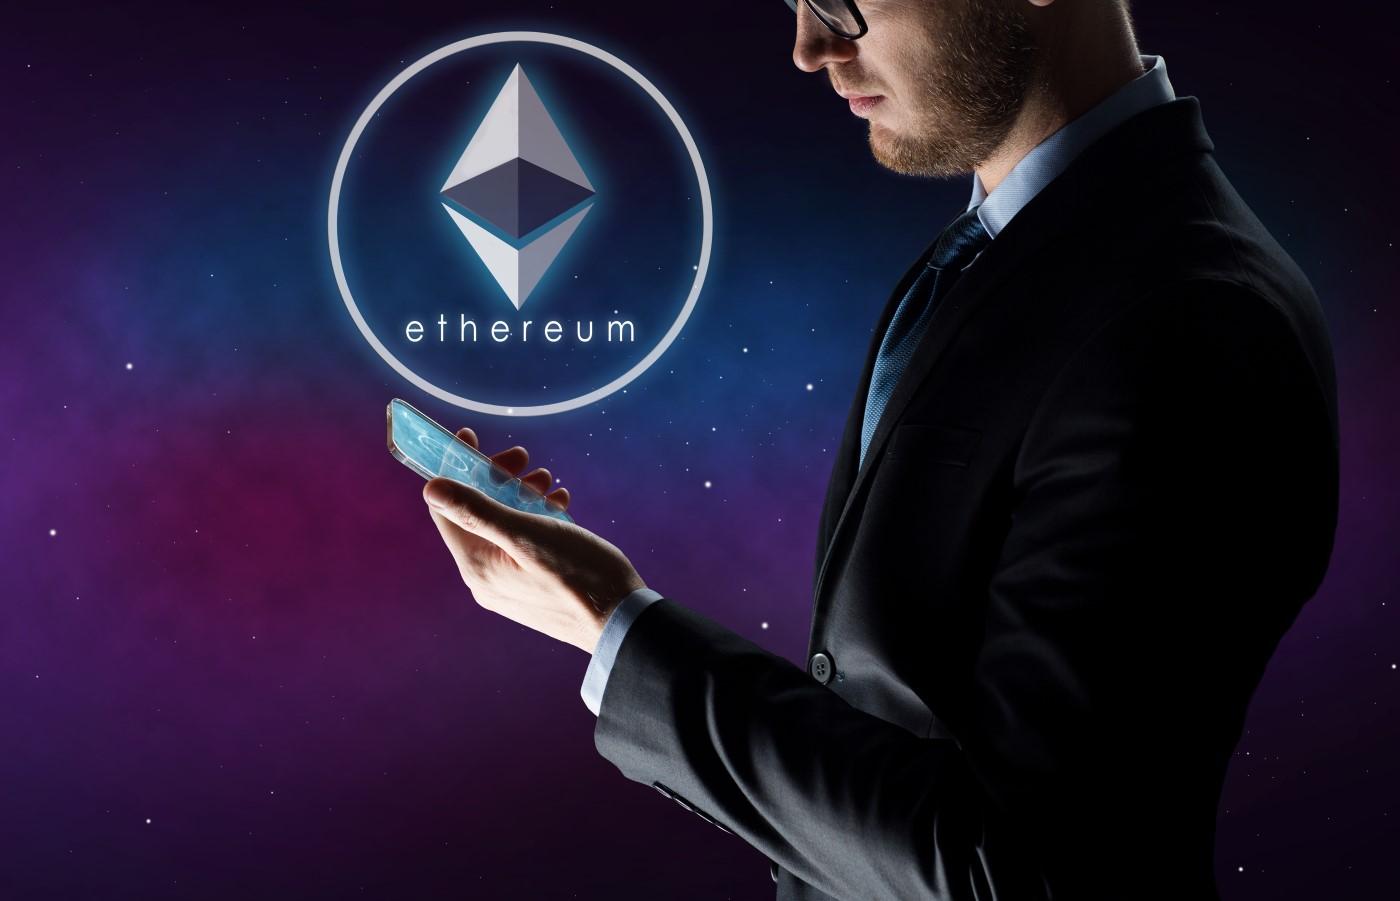 banco-innovación-blockchain-eth